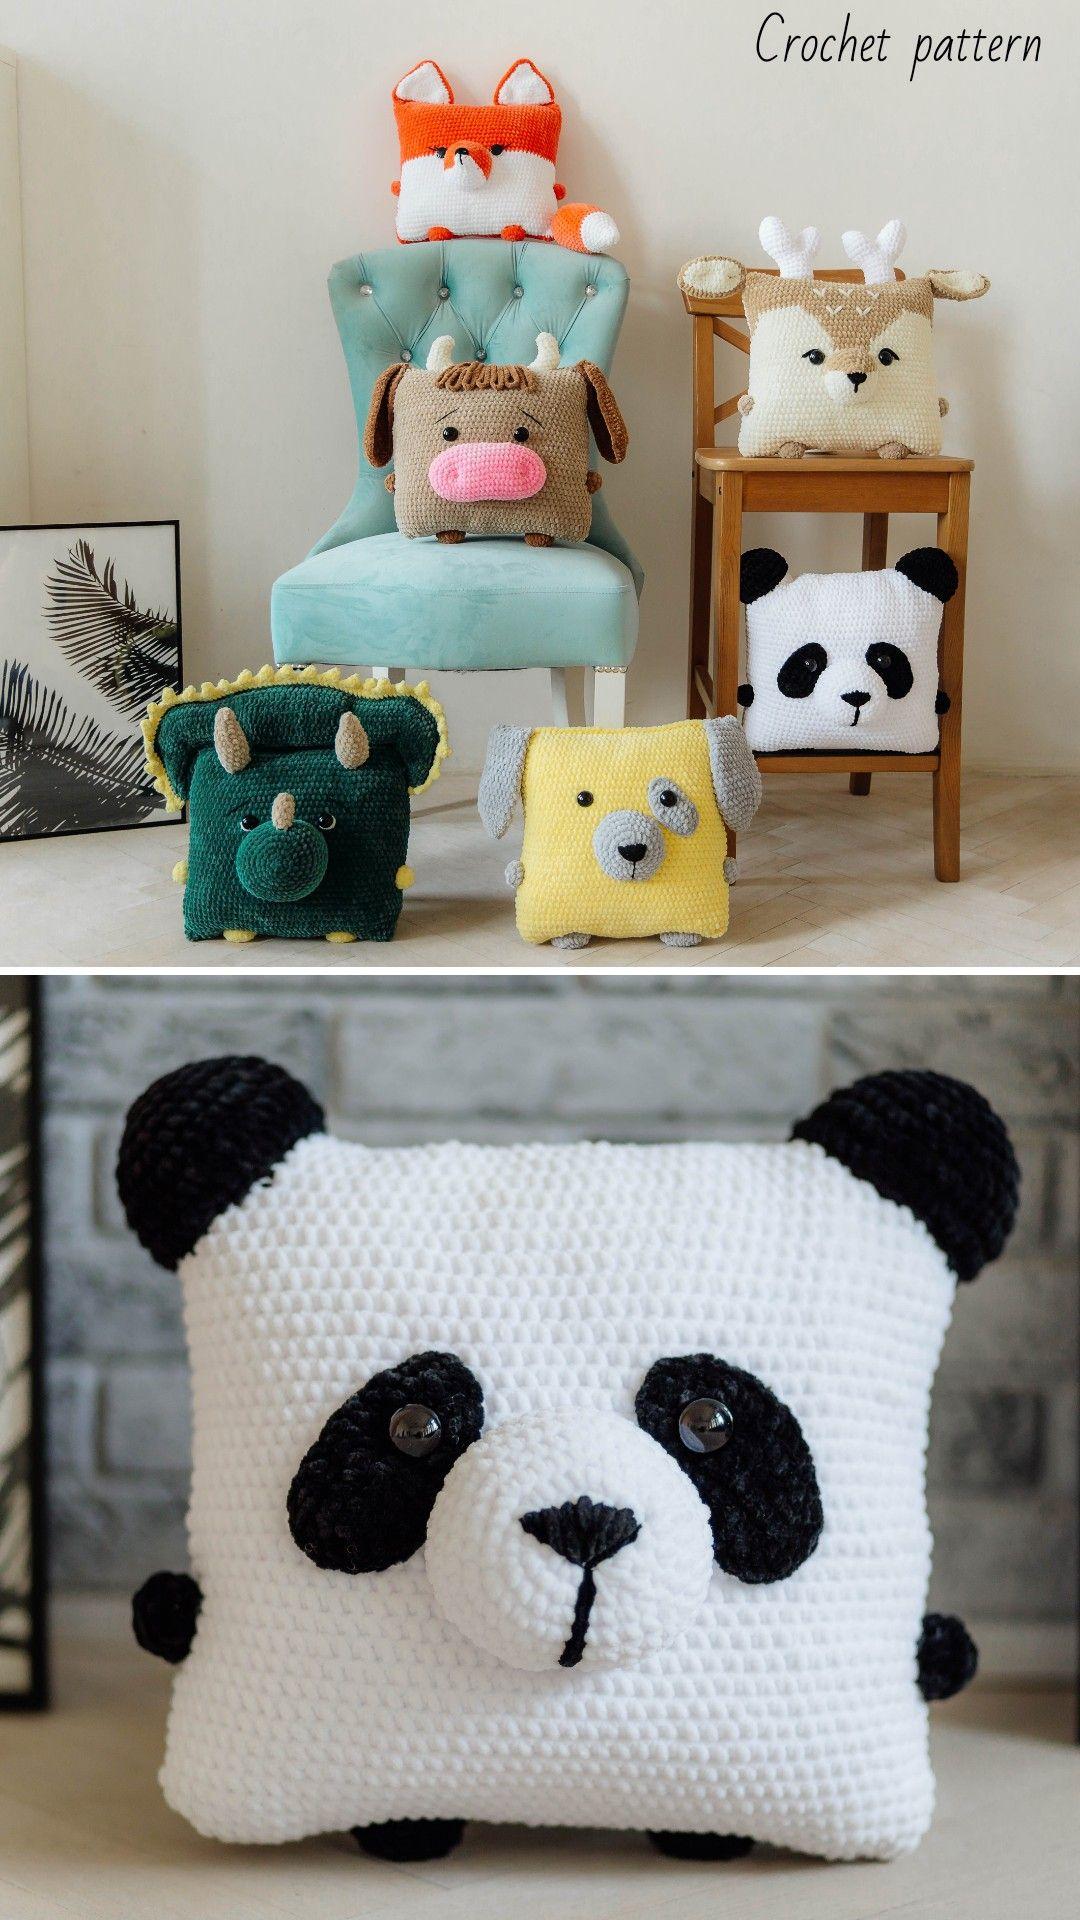 Crochet pattern pillow, amigurumi tutorial, crochet animal, amigurumi pet, crochet home decor, toys